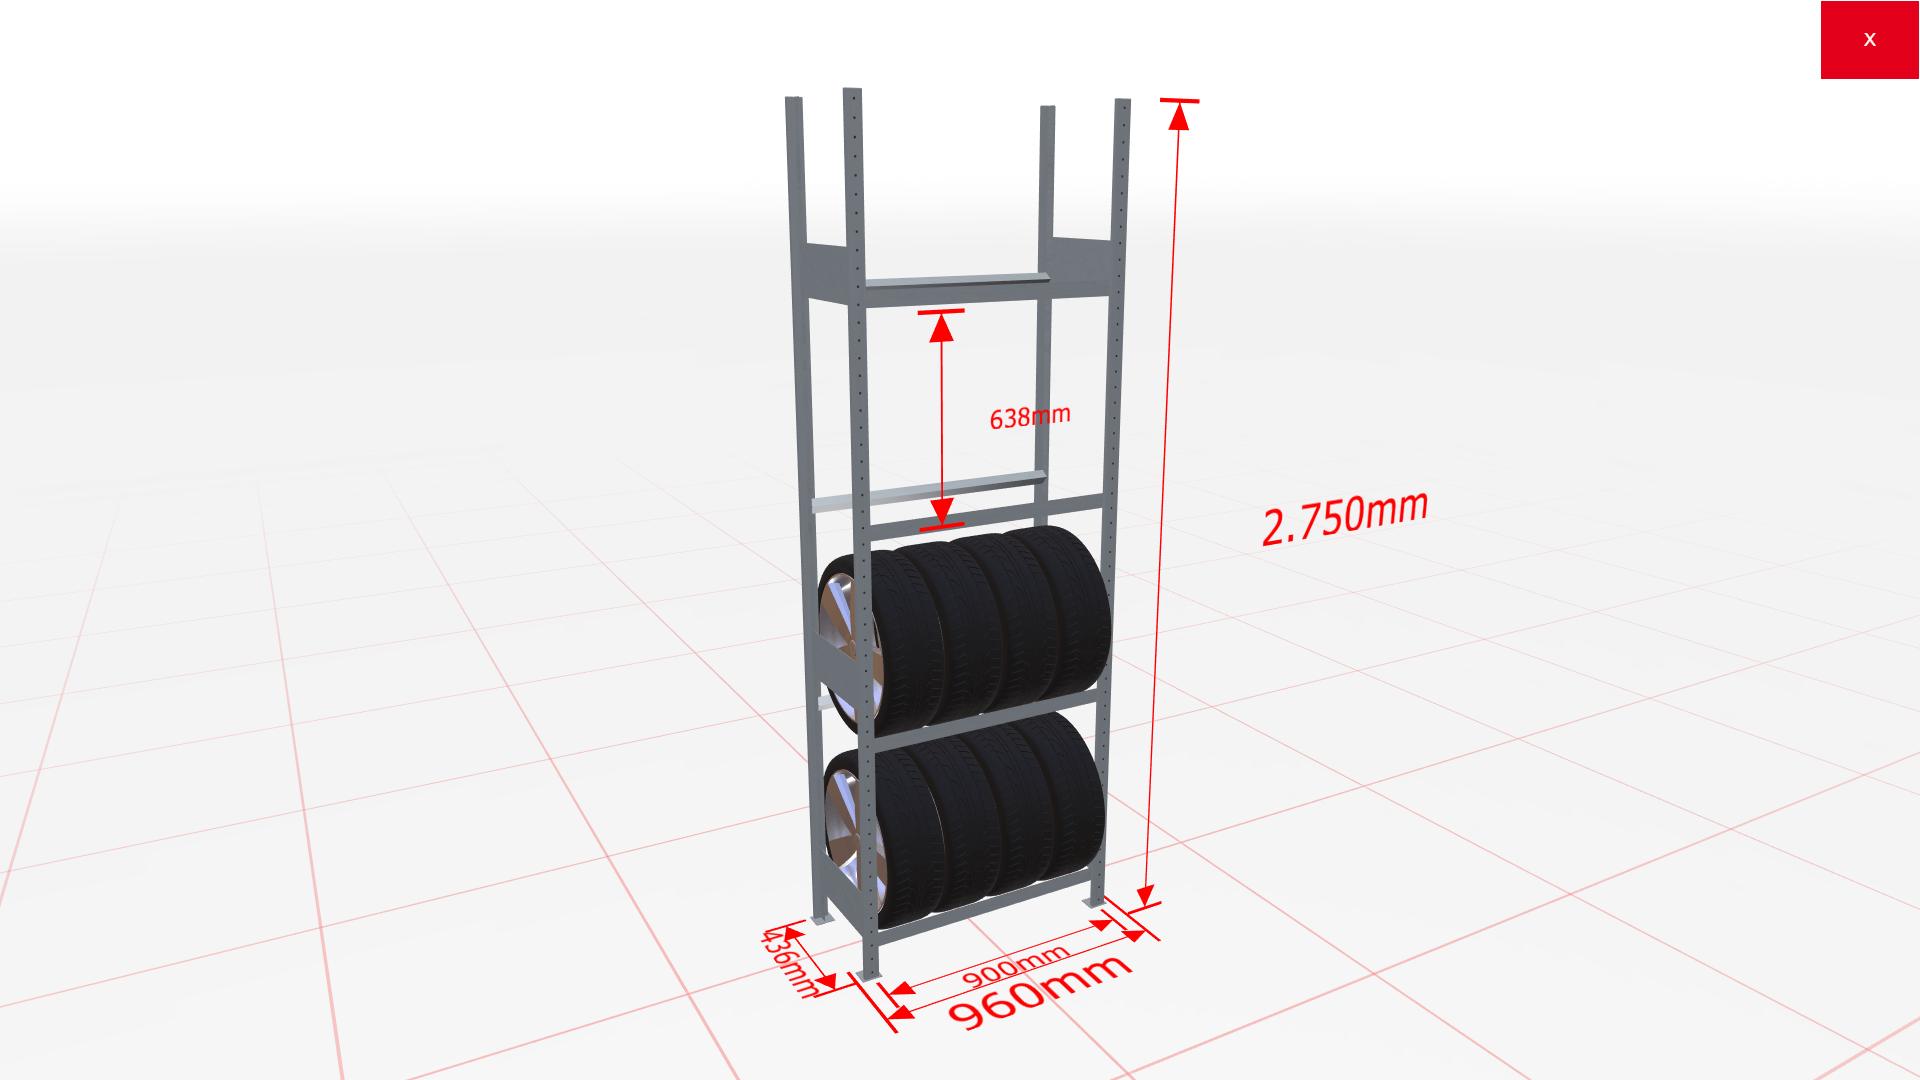 Räderregal Grundregal SCHULTE Lagertechnik 2750x900x400 mm – 4 Ebenen à 900 mm, verzinkt